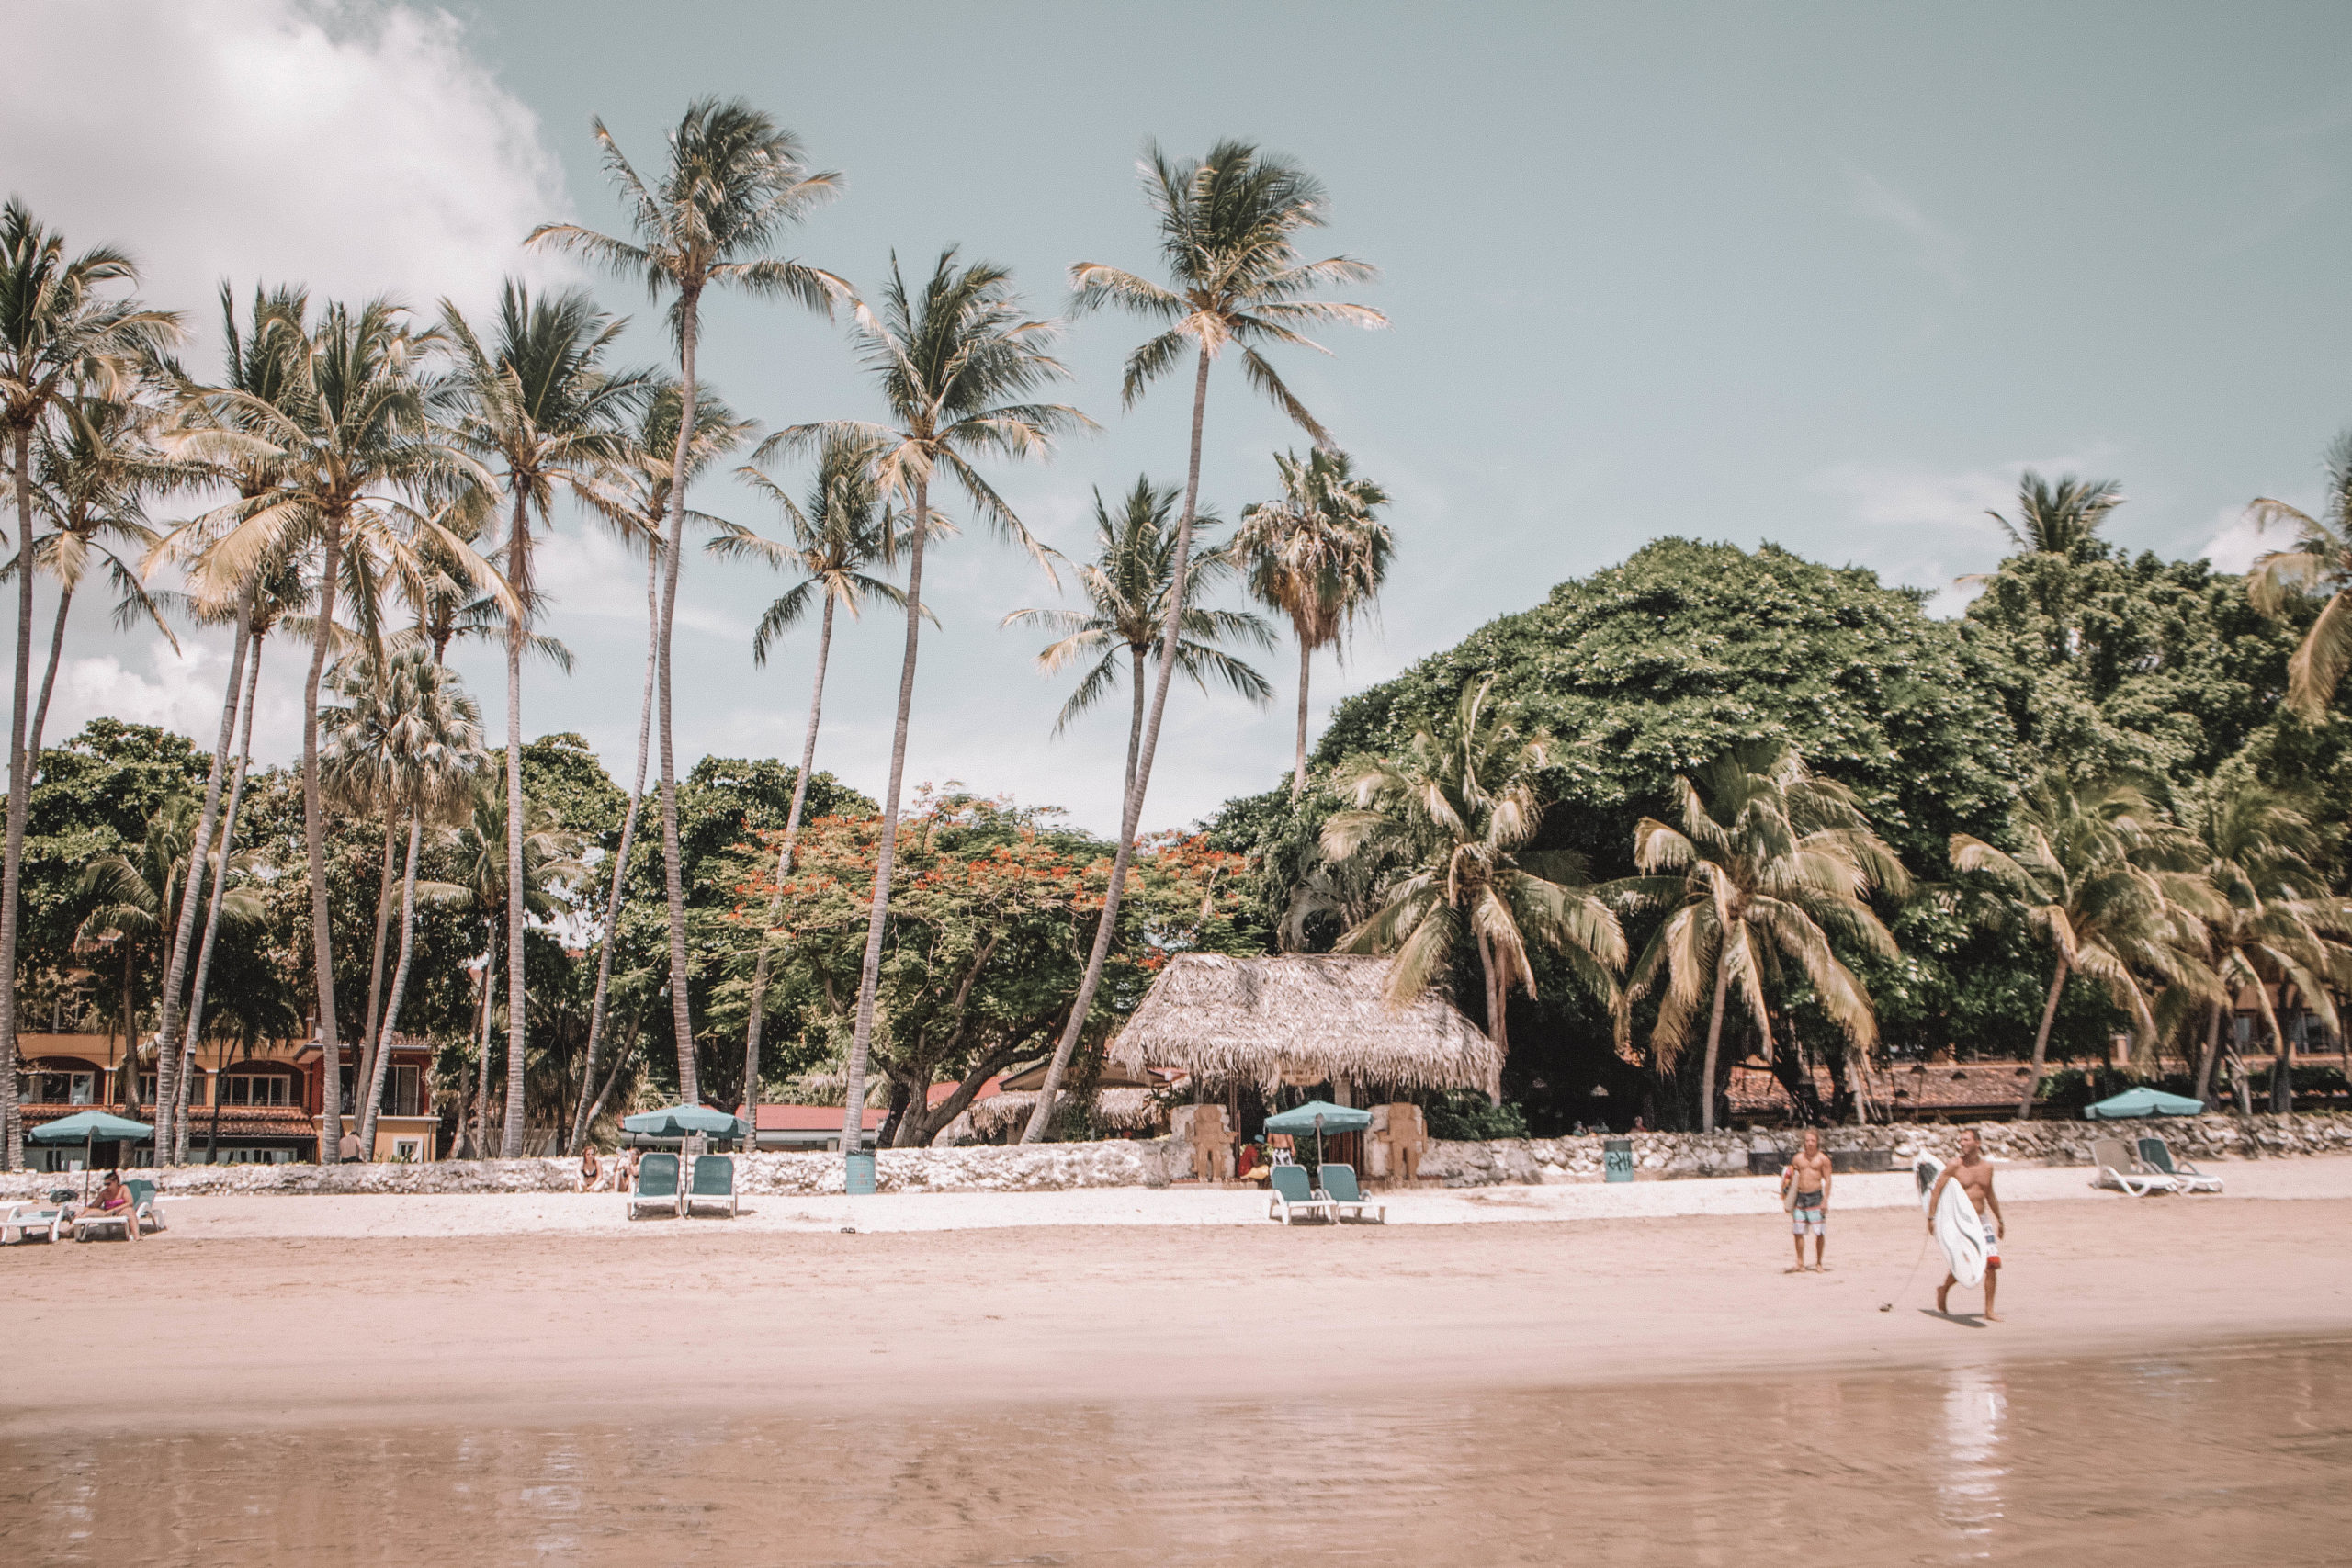 24 HOURS IN TAMARINDO // COSTA RICA EDIT